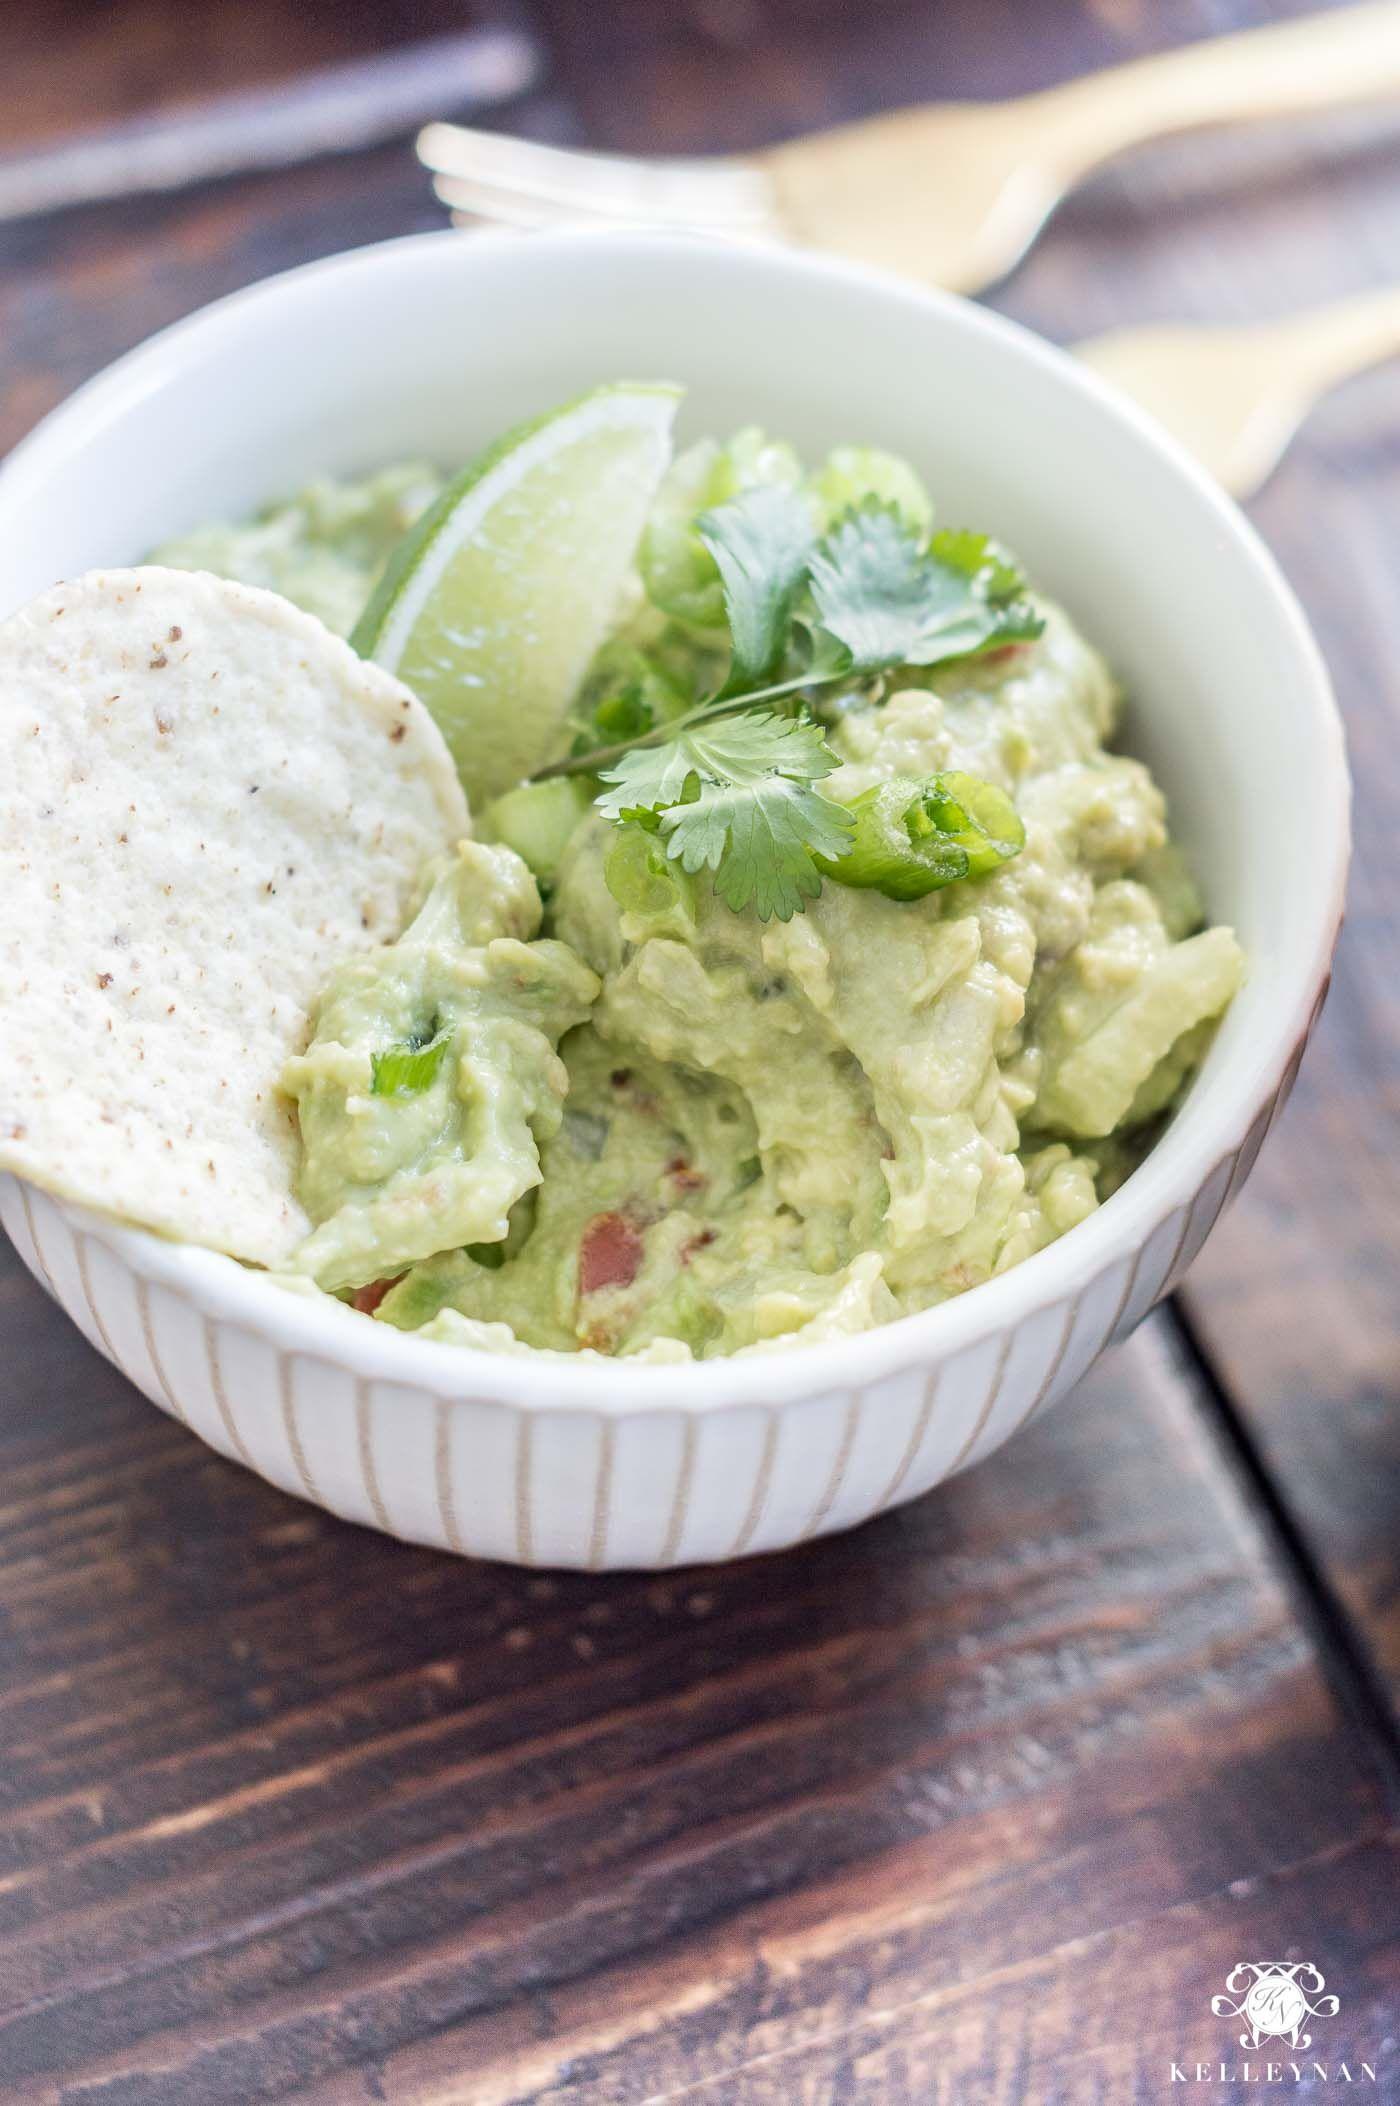 Cinco De Mayo Mexican Fiesta Dinner Party Ideas Plus The Best Authentic Guacamole Rec Guacamole Recipe Guacamole Recipe Easy Guacamole Recipe With Sour Cream